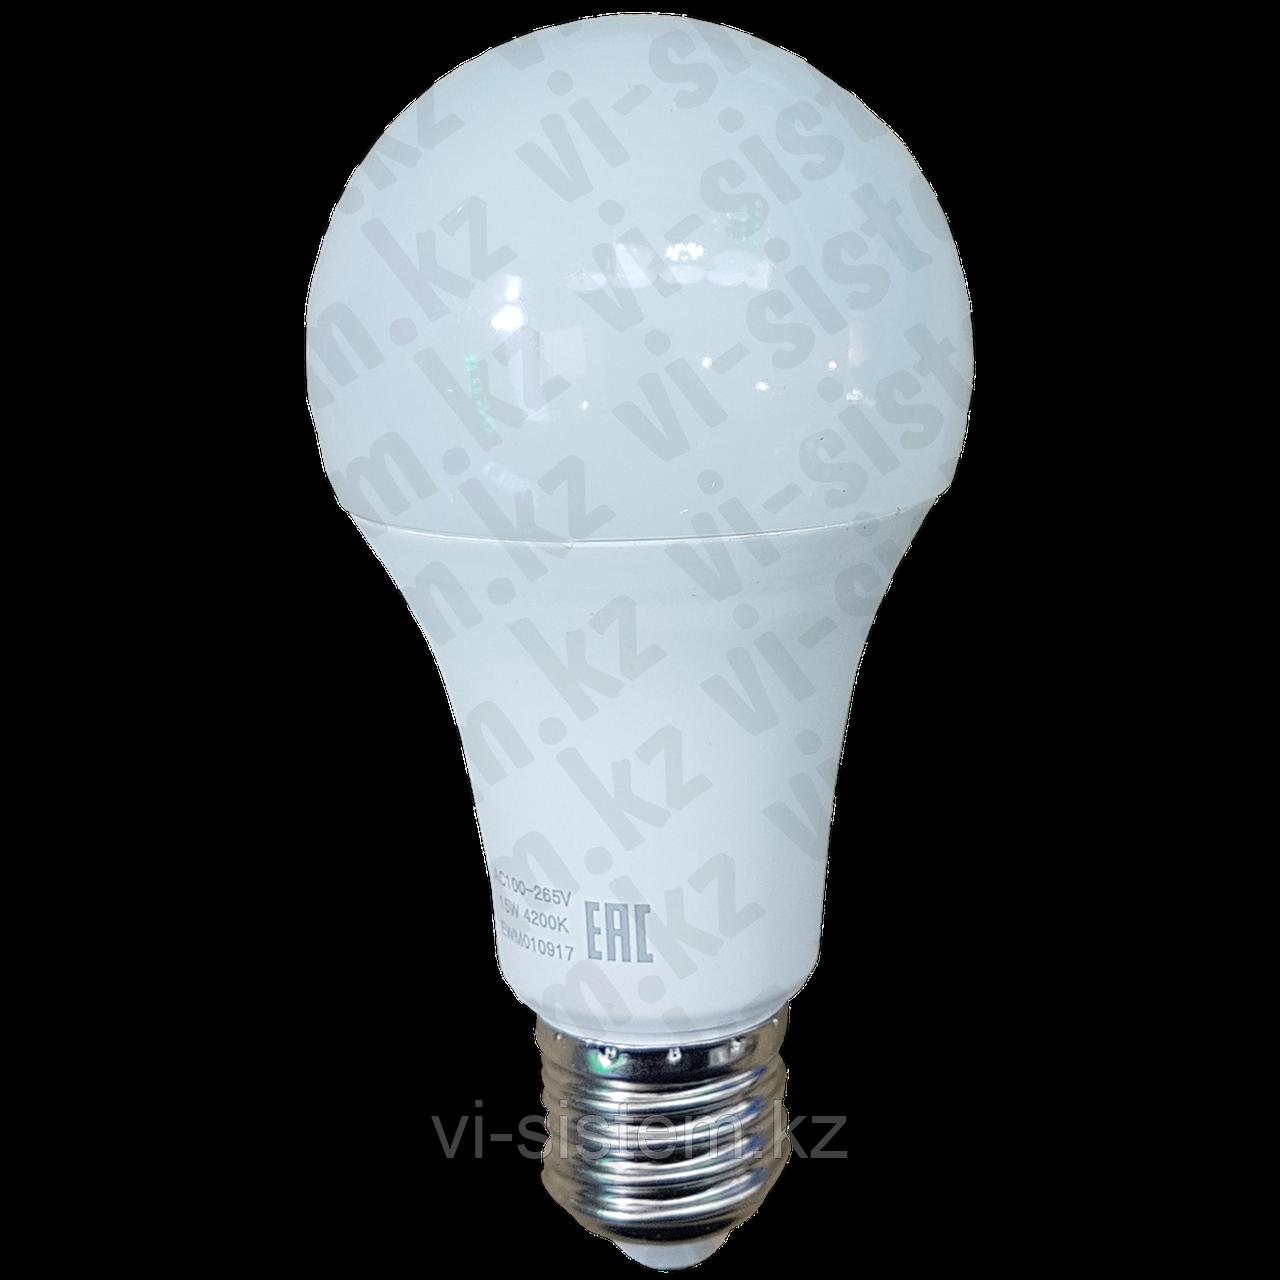 Лампа светодиодная Mlight 15W E27 4200k